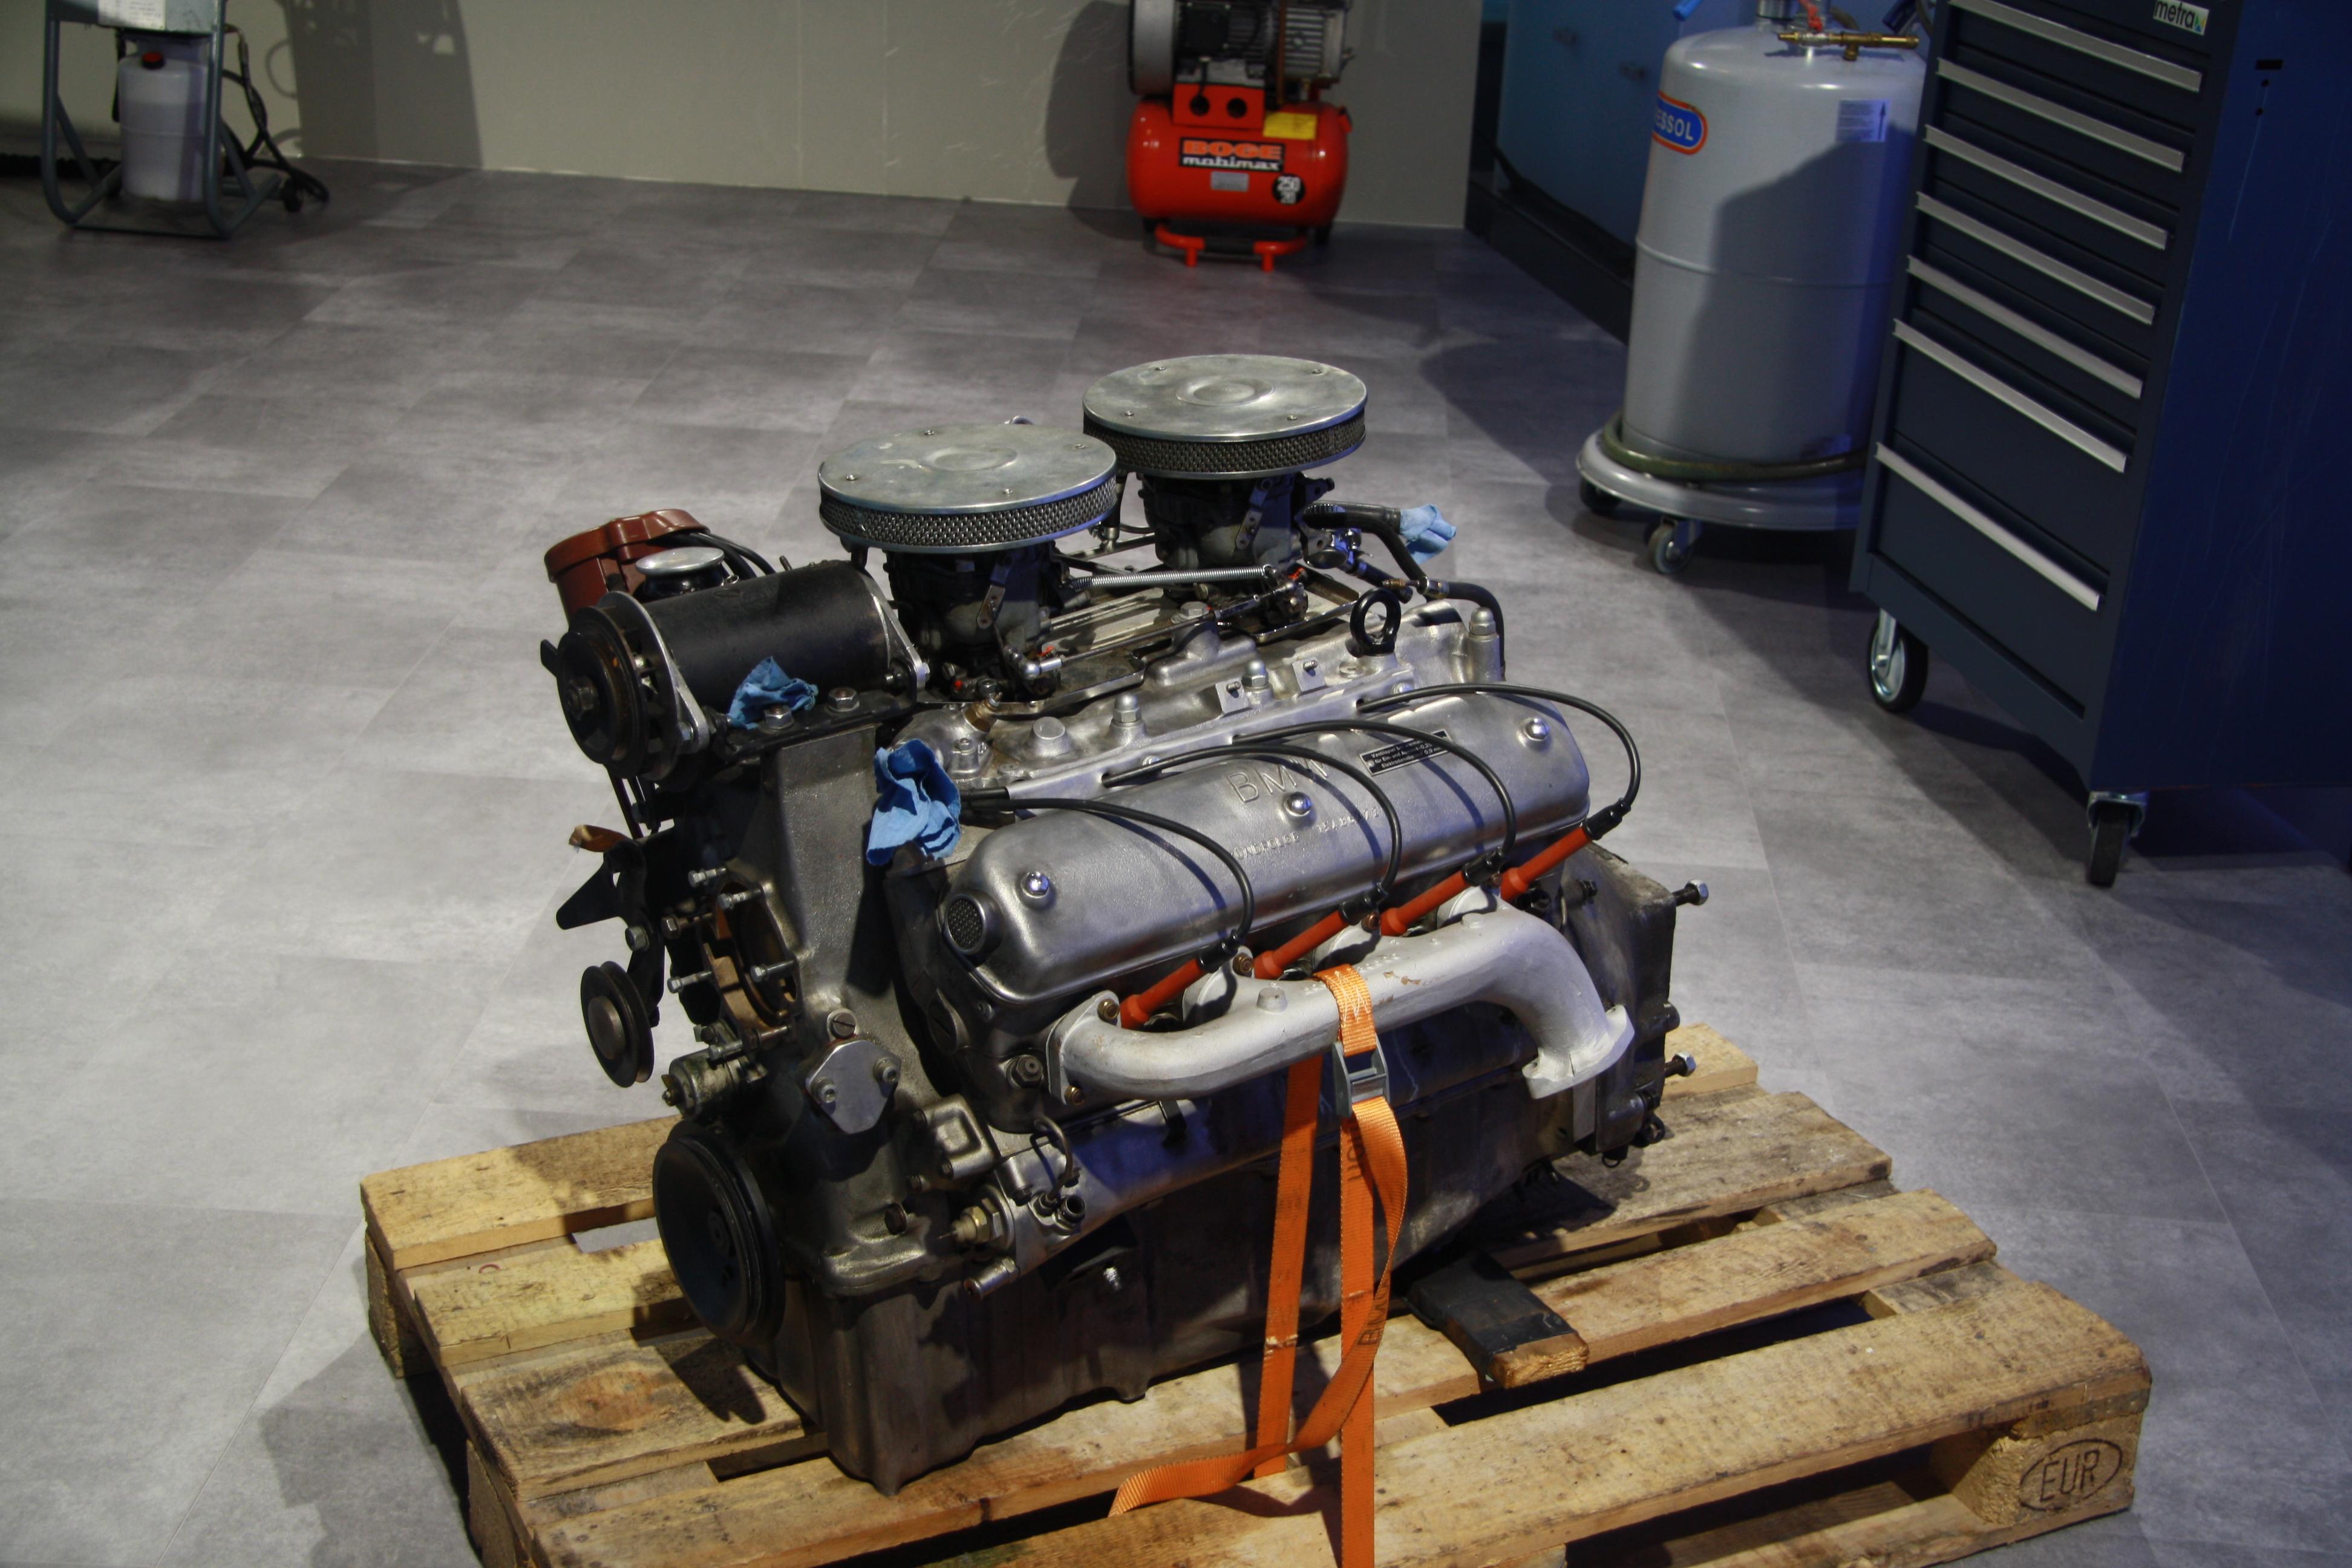 FileEngine Of BMW 507 In Museum Munich BayernJPG